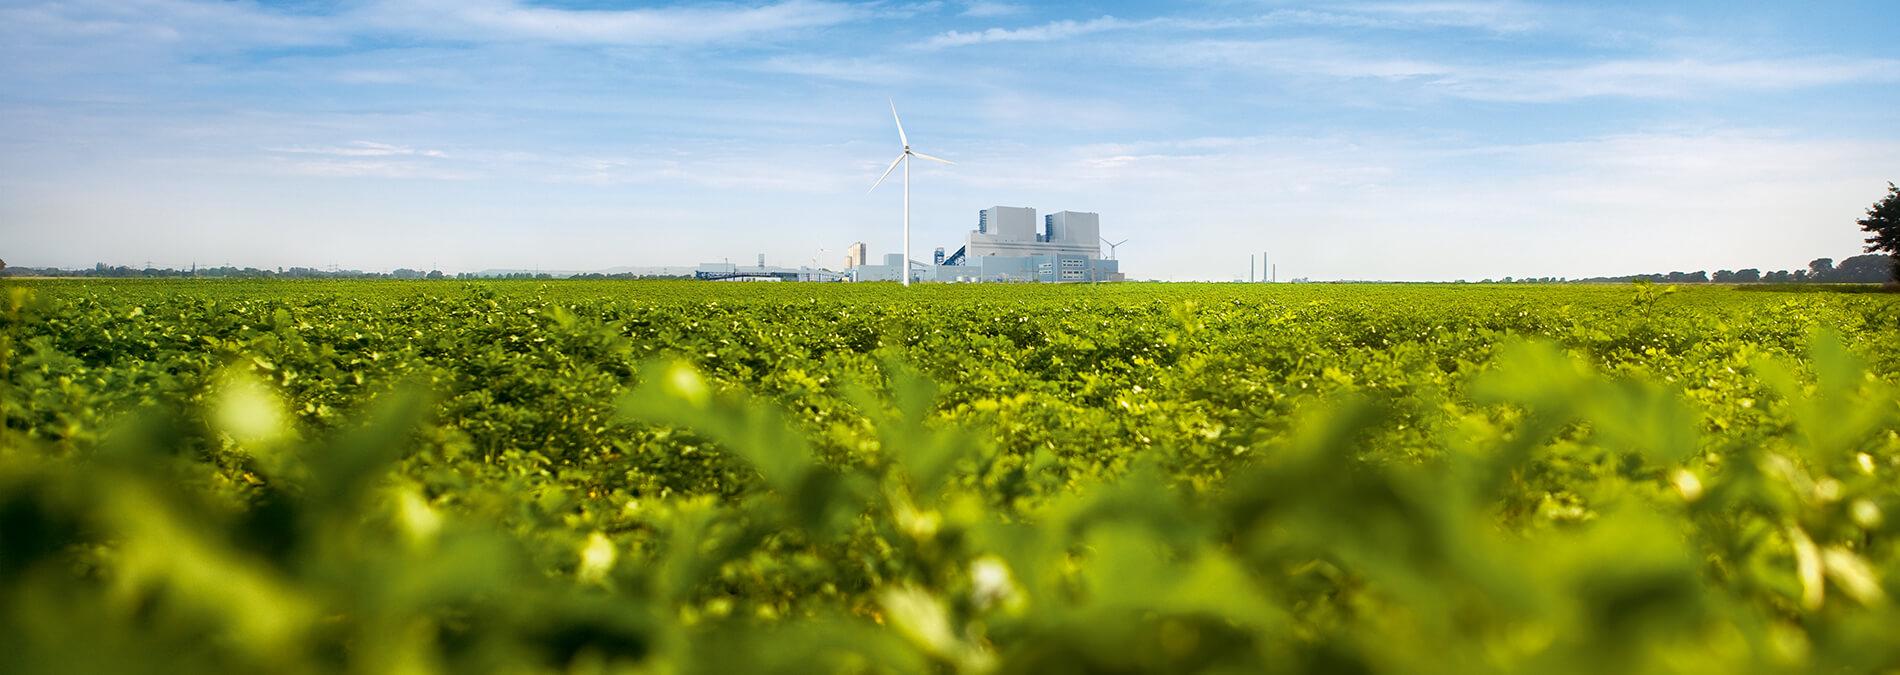 Kraftwerk in der Ferne vor grüner Landschaft